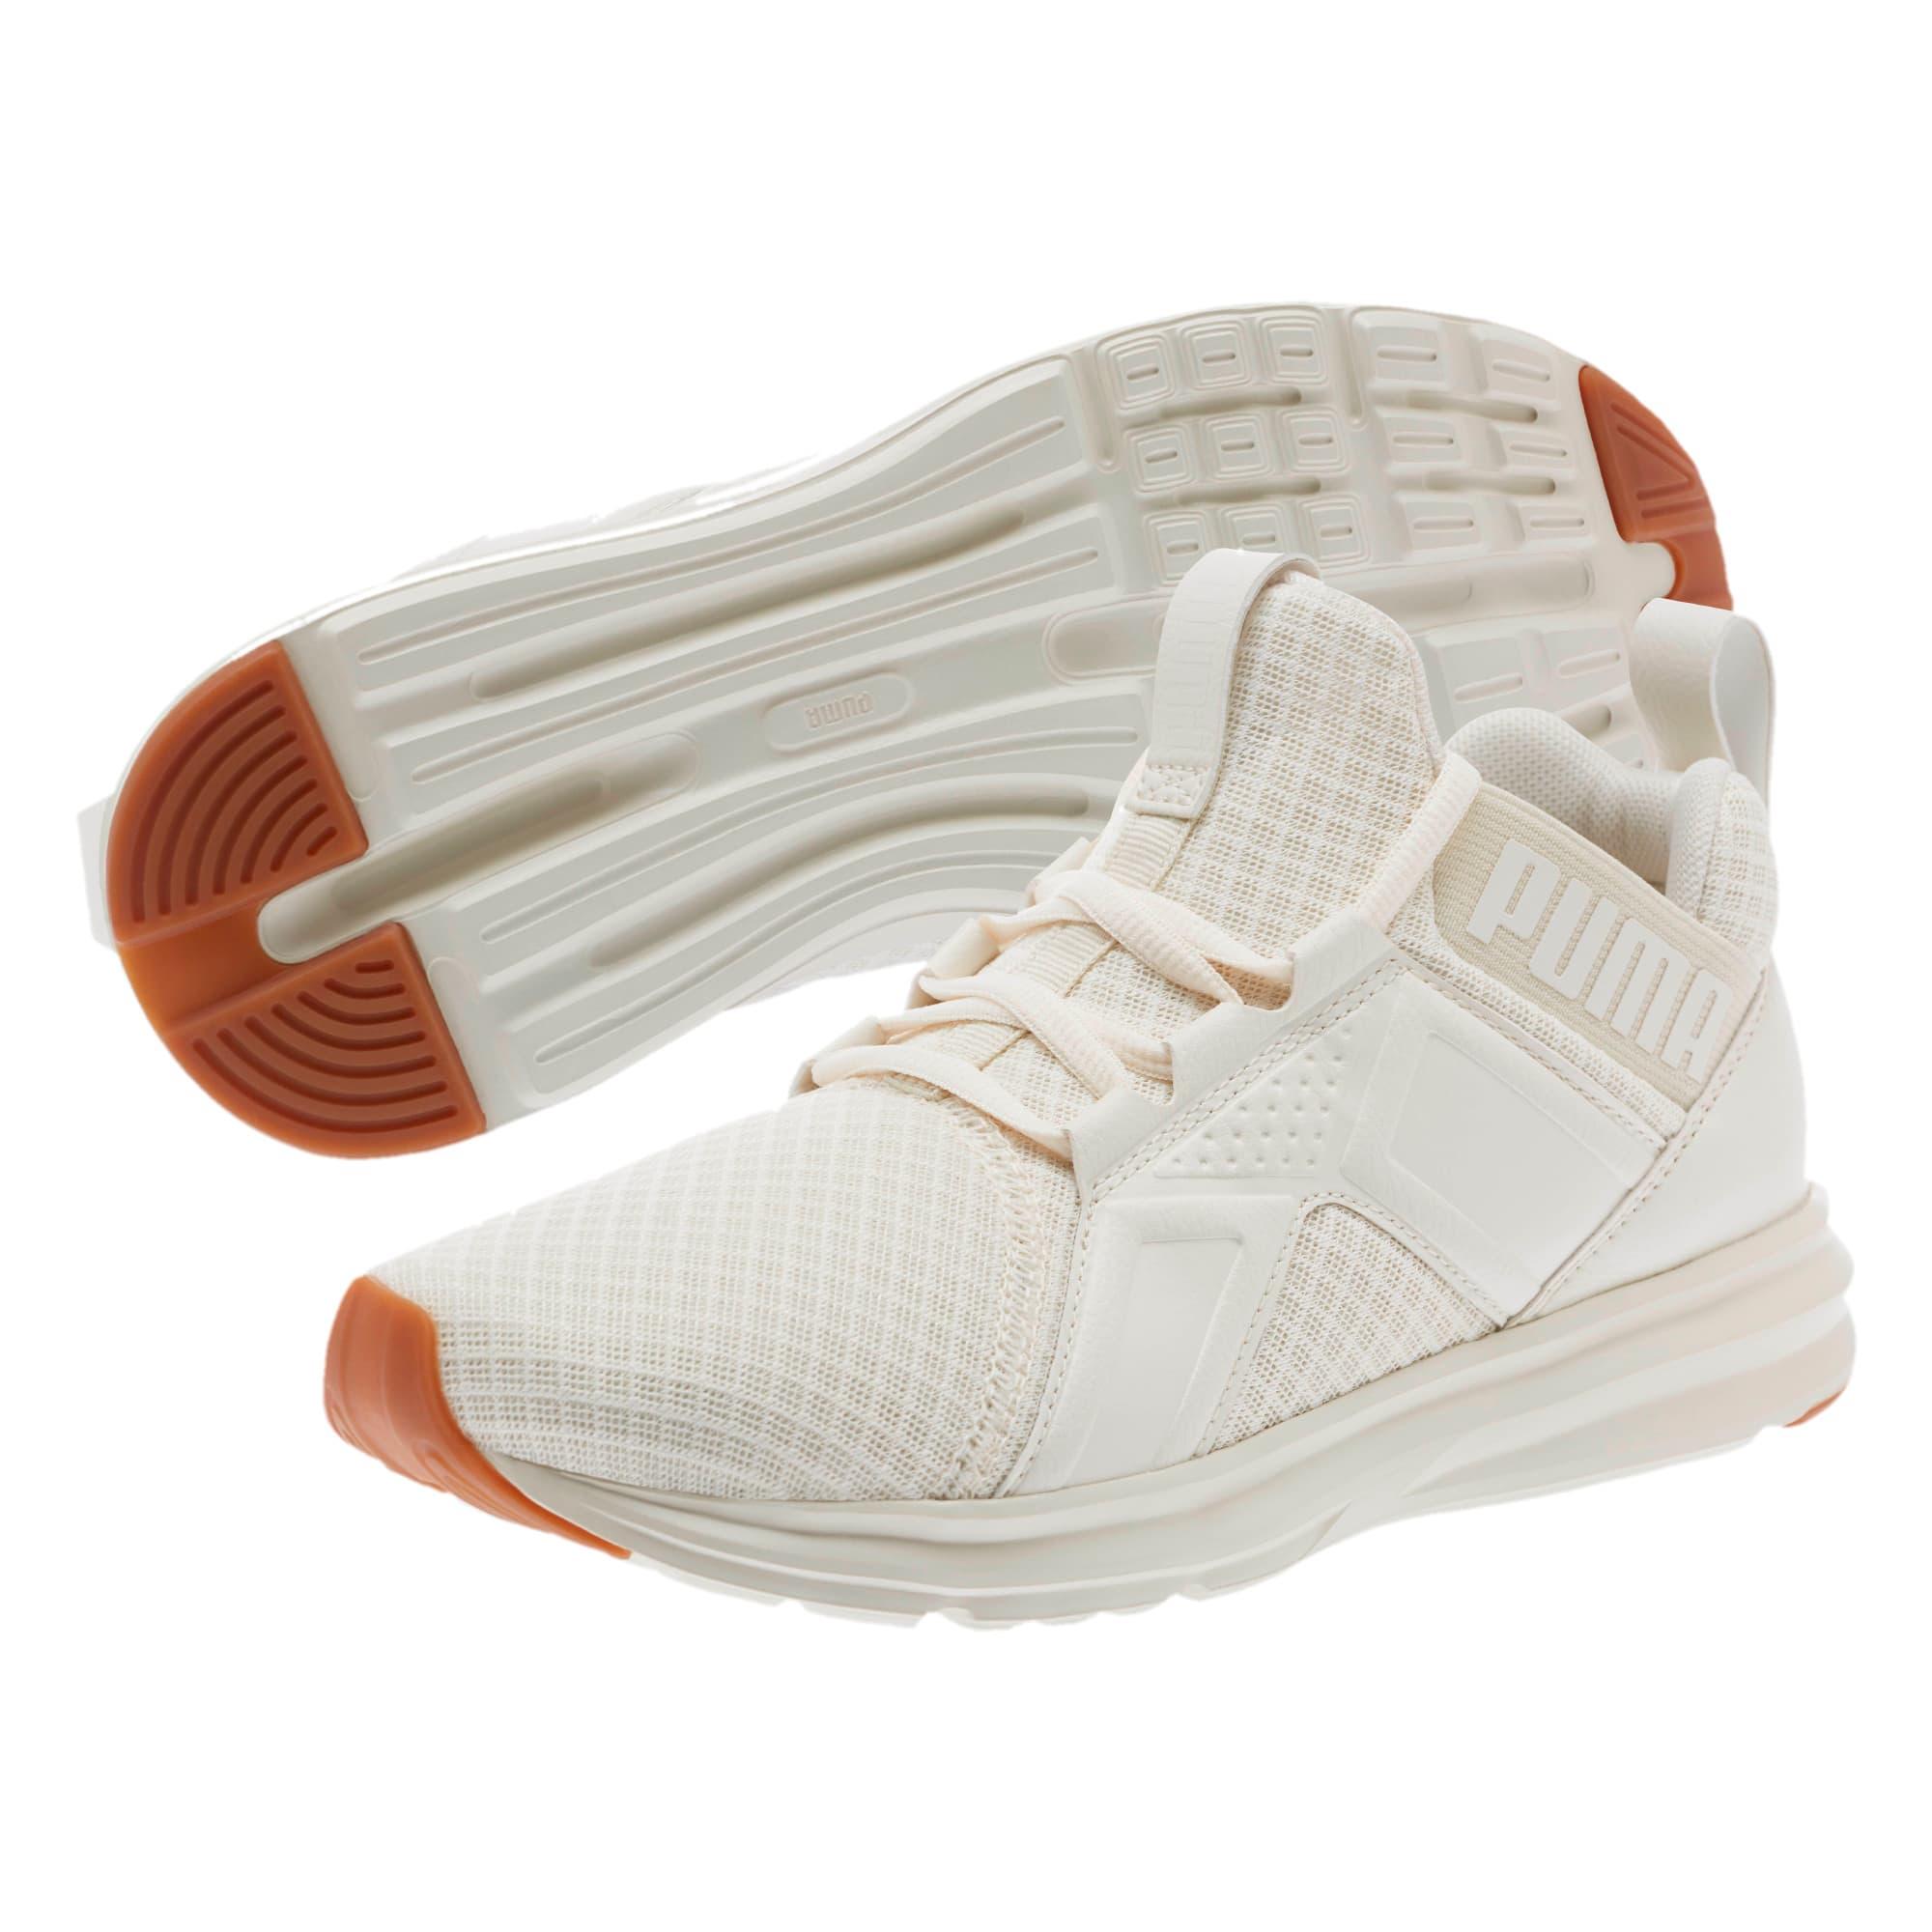 Thumbnail 1 of Enzo Premium Mesh Women's Sneakers, Whisper White, medium